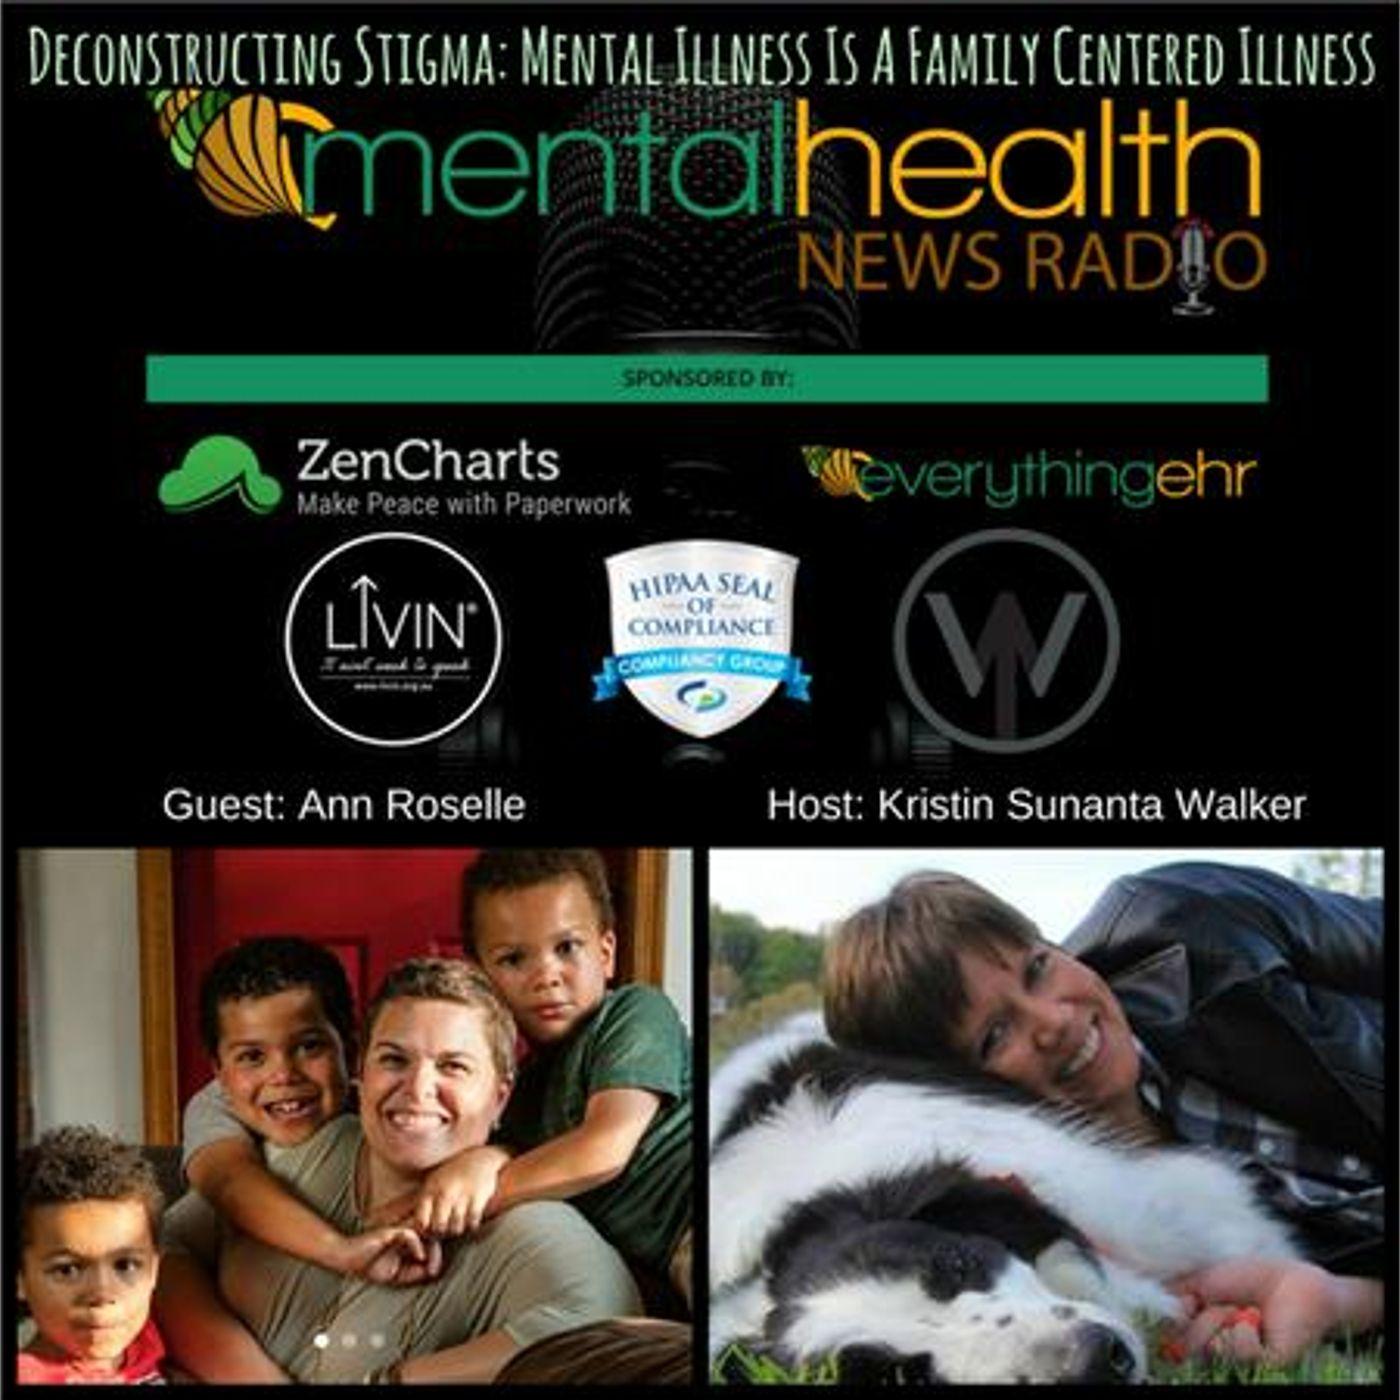 Mental Health News Radio - Deconstructing Stigma: Mental Illness is a Family Centered Illness